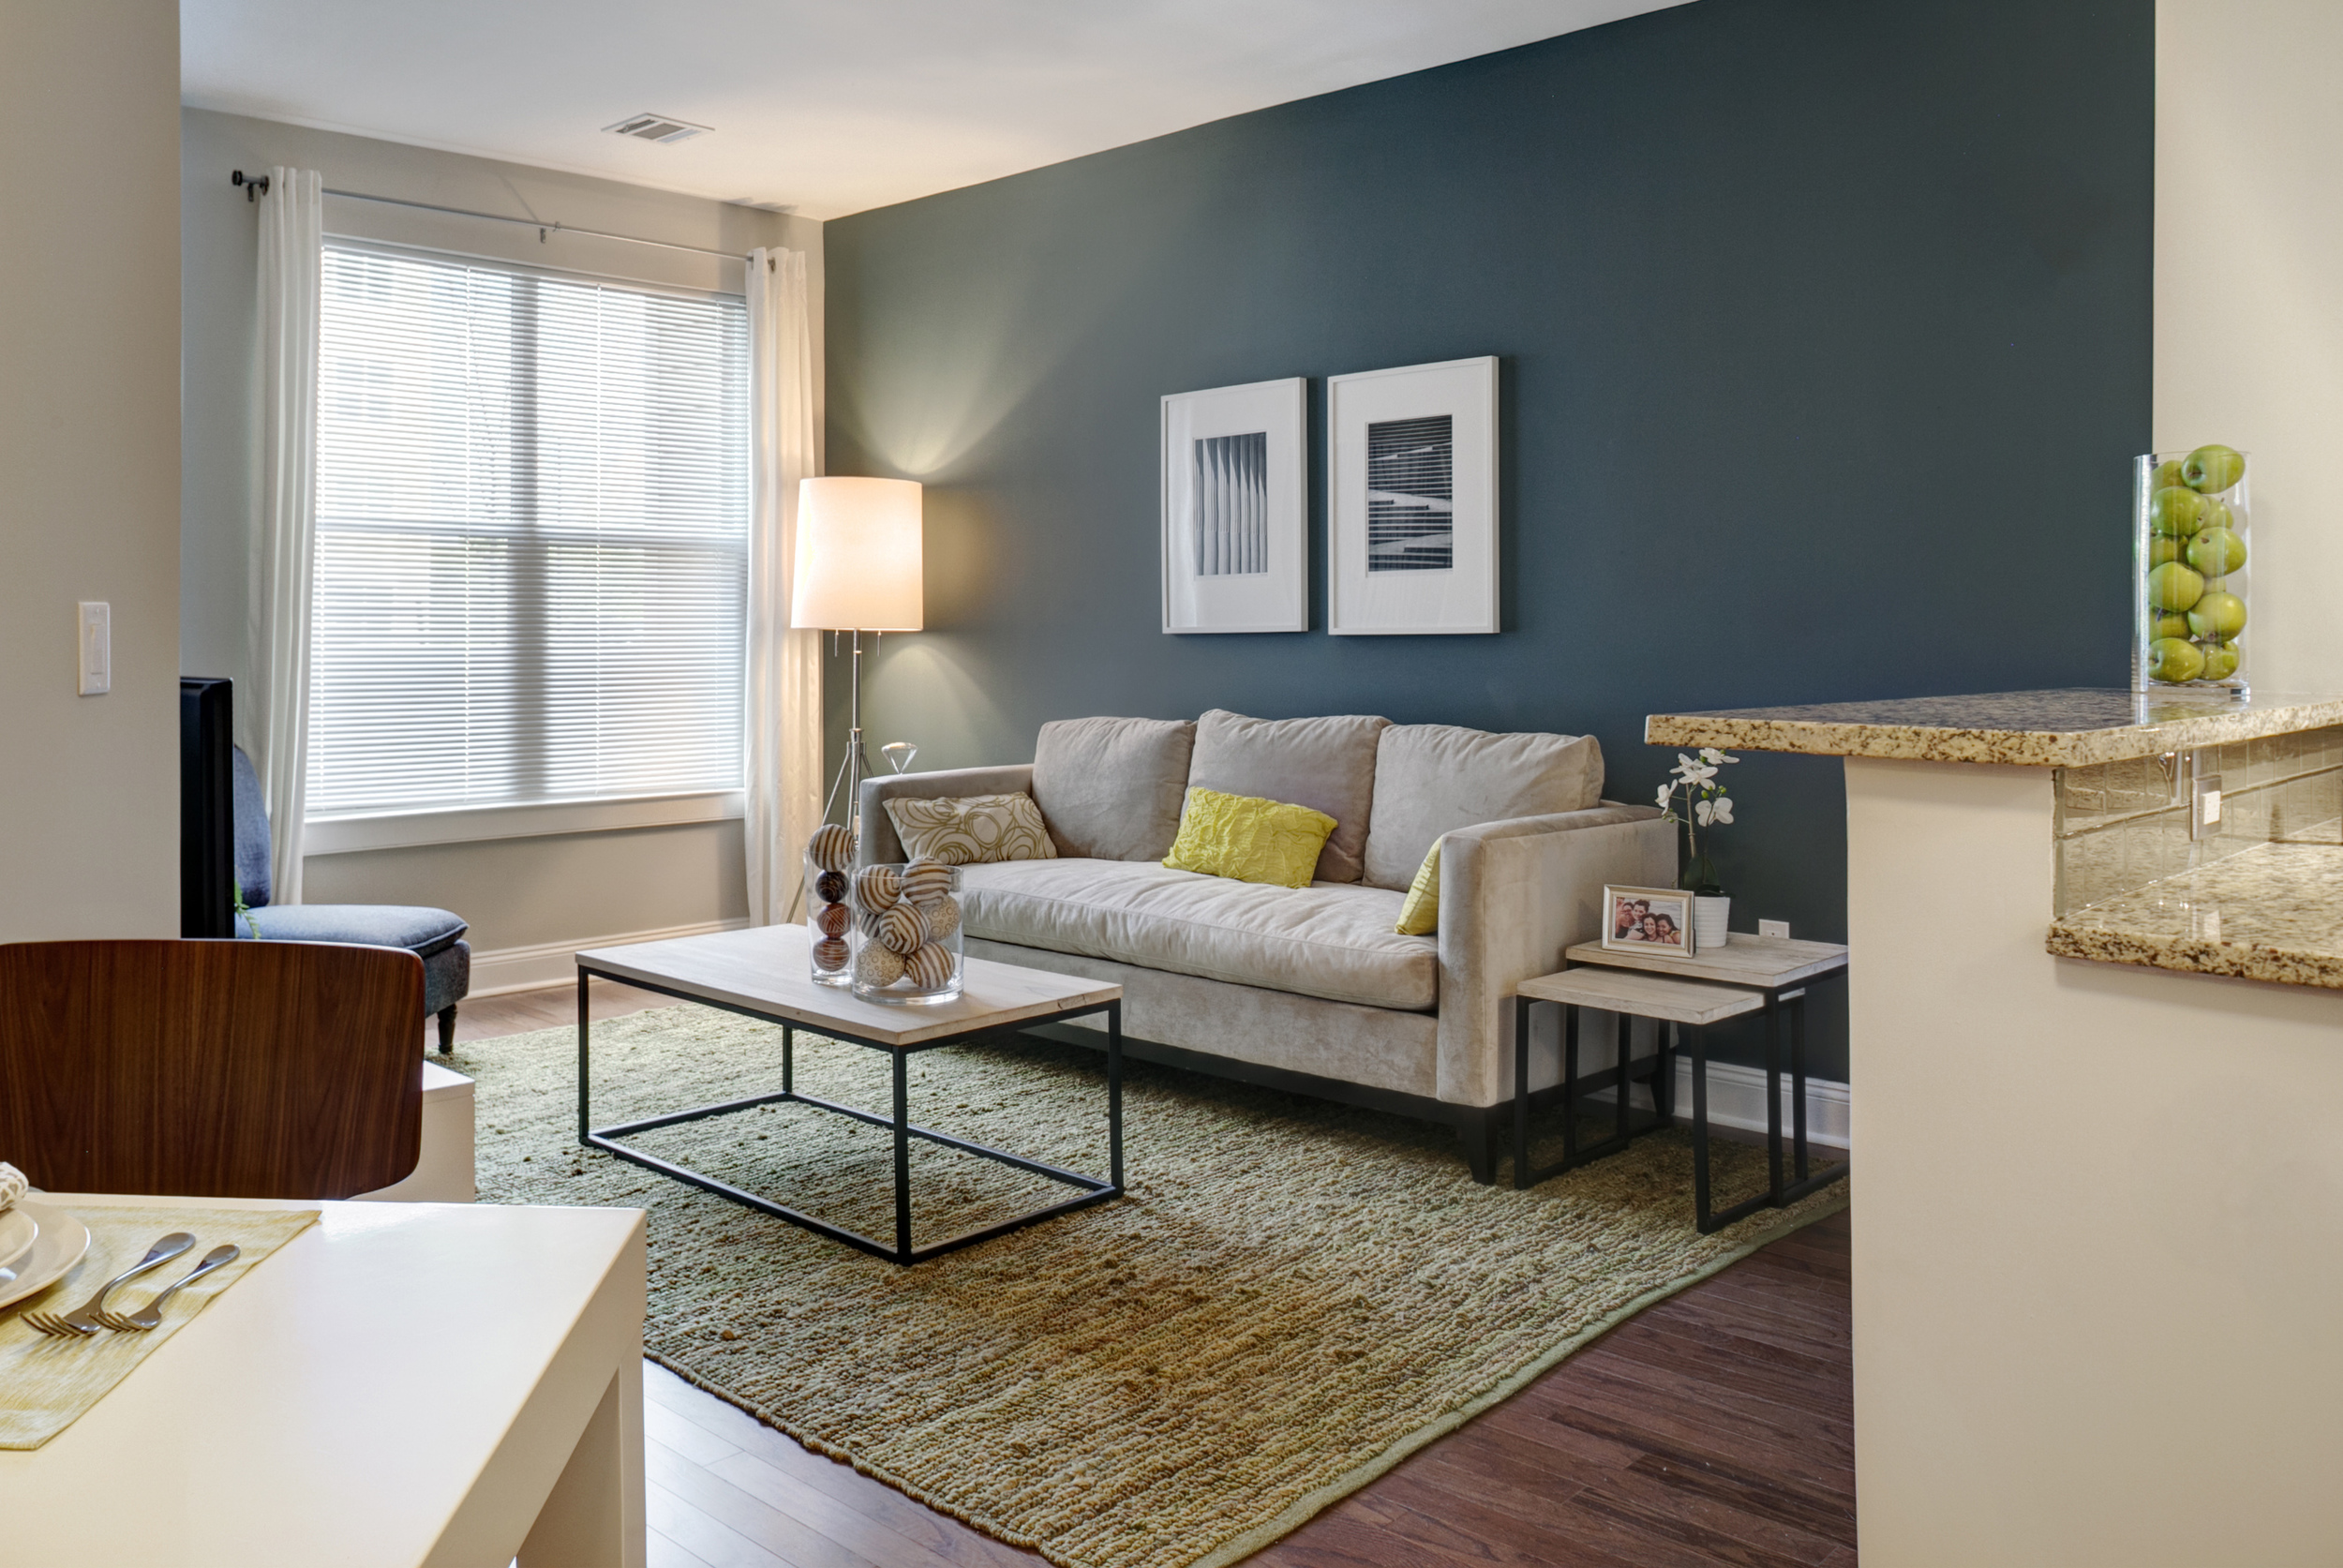 1 Bedroom Model Living Room.jpg